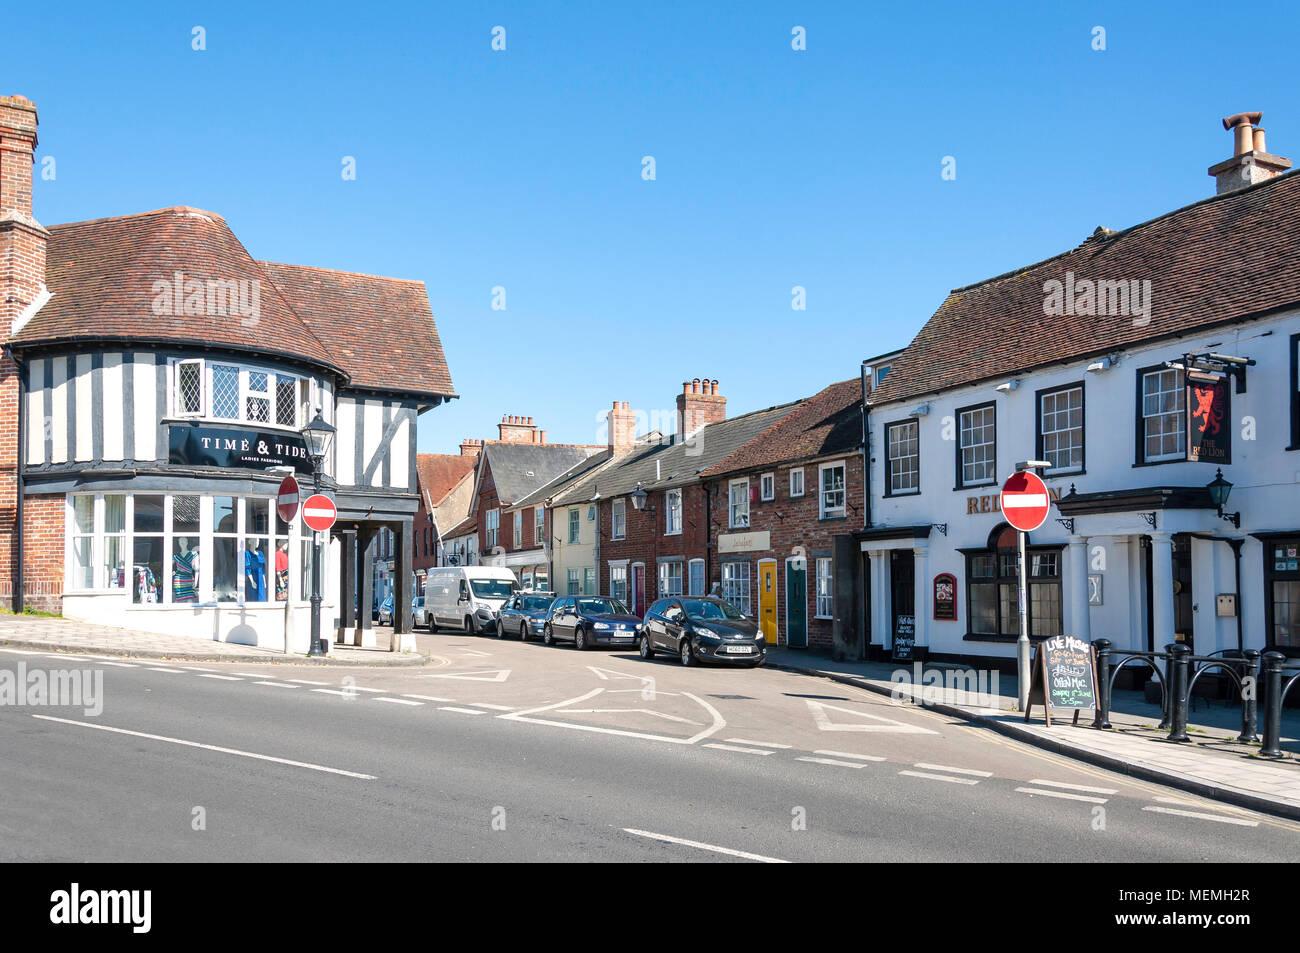 High Street, Milford-on-Sea, Hampshire, England, United Kingdom - Stock Image